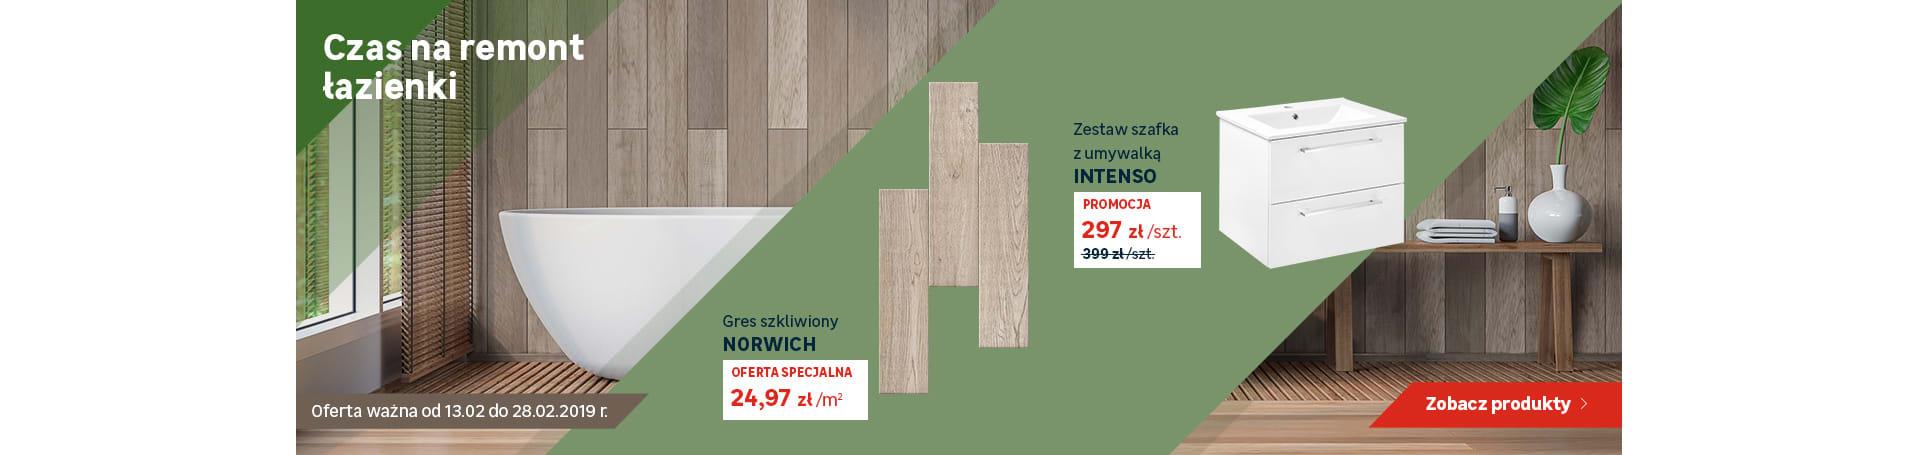 sk-glazura-gresy-linia1-13-20.02.2019-1323x455